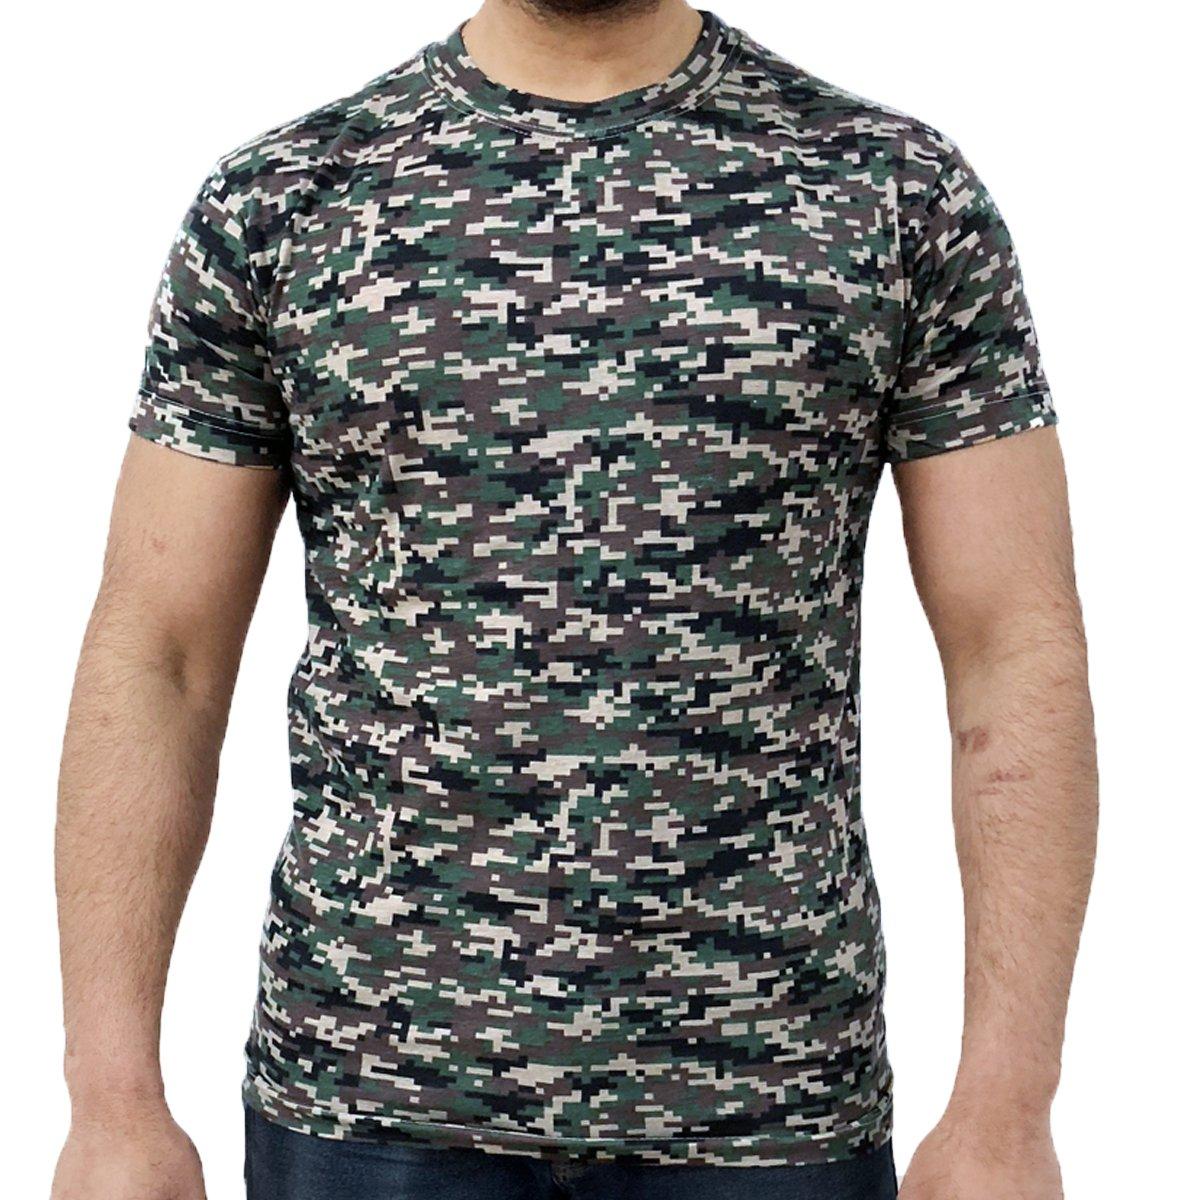 Game Digital Camouflage T-Shirts - Digital Woodland S